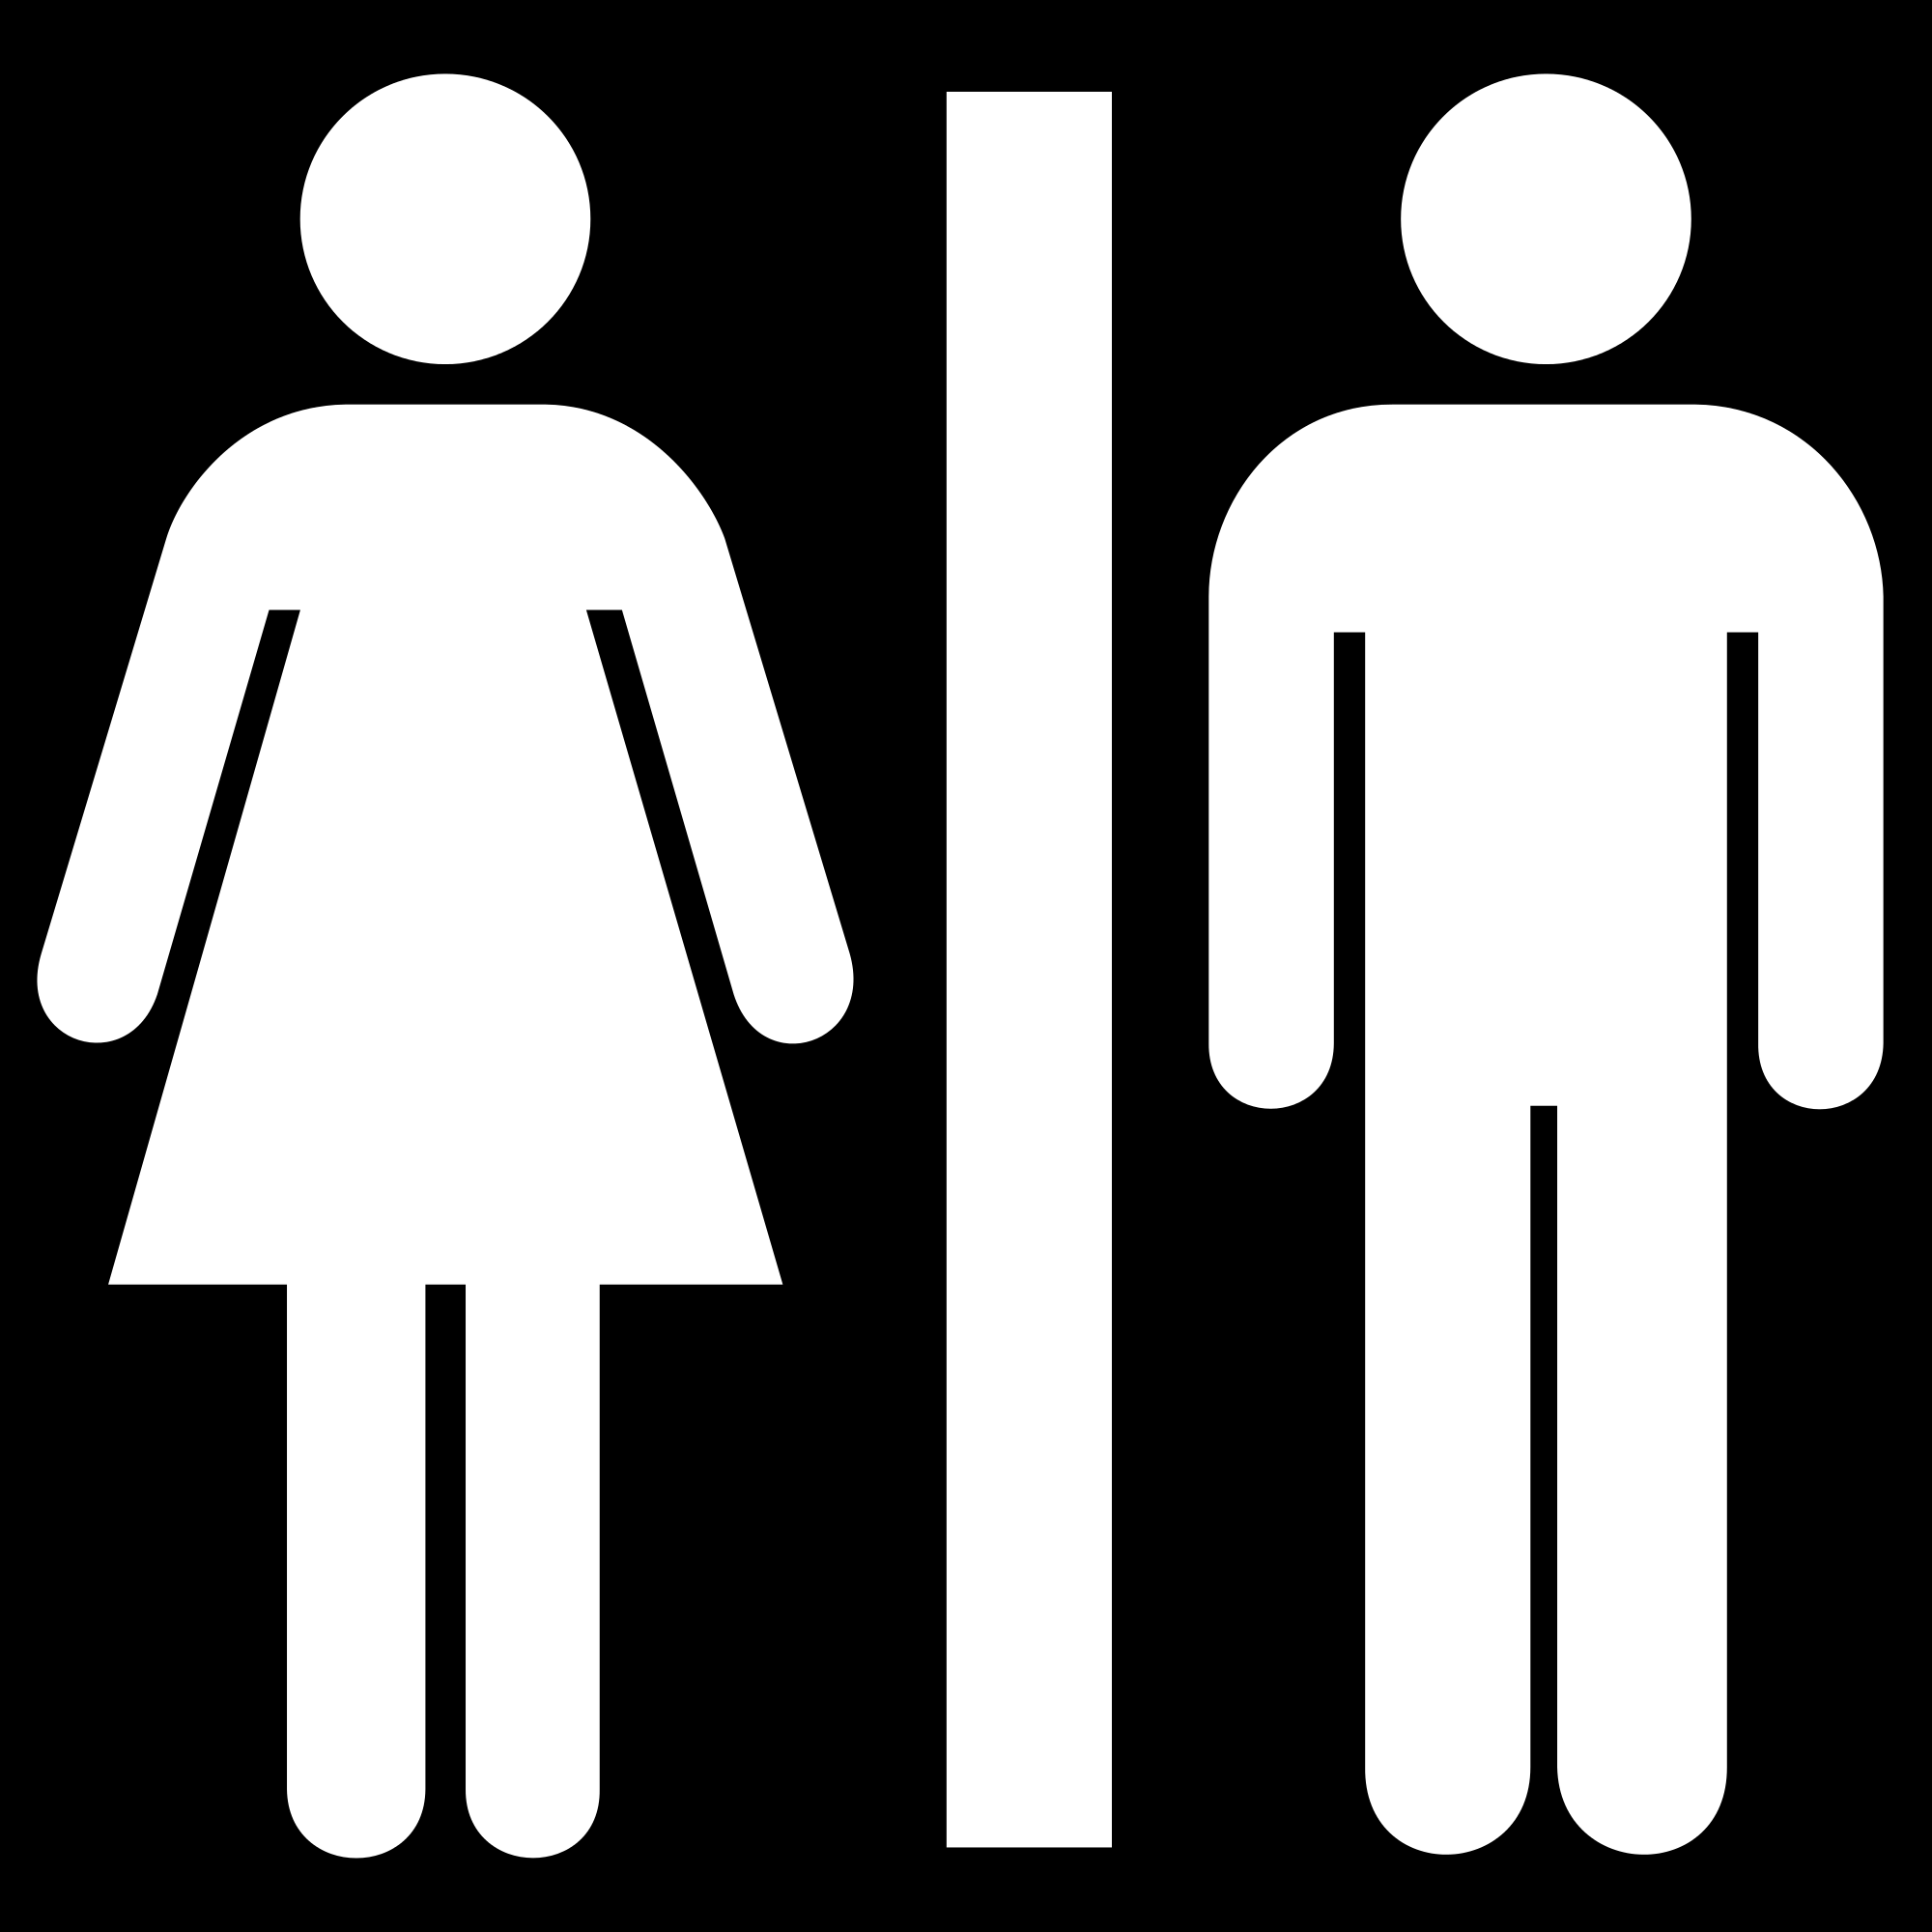 Toilet svg #18, Download drawings